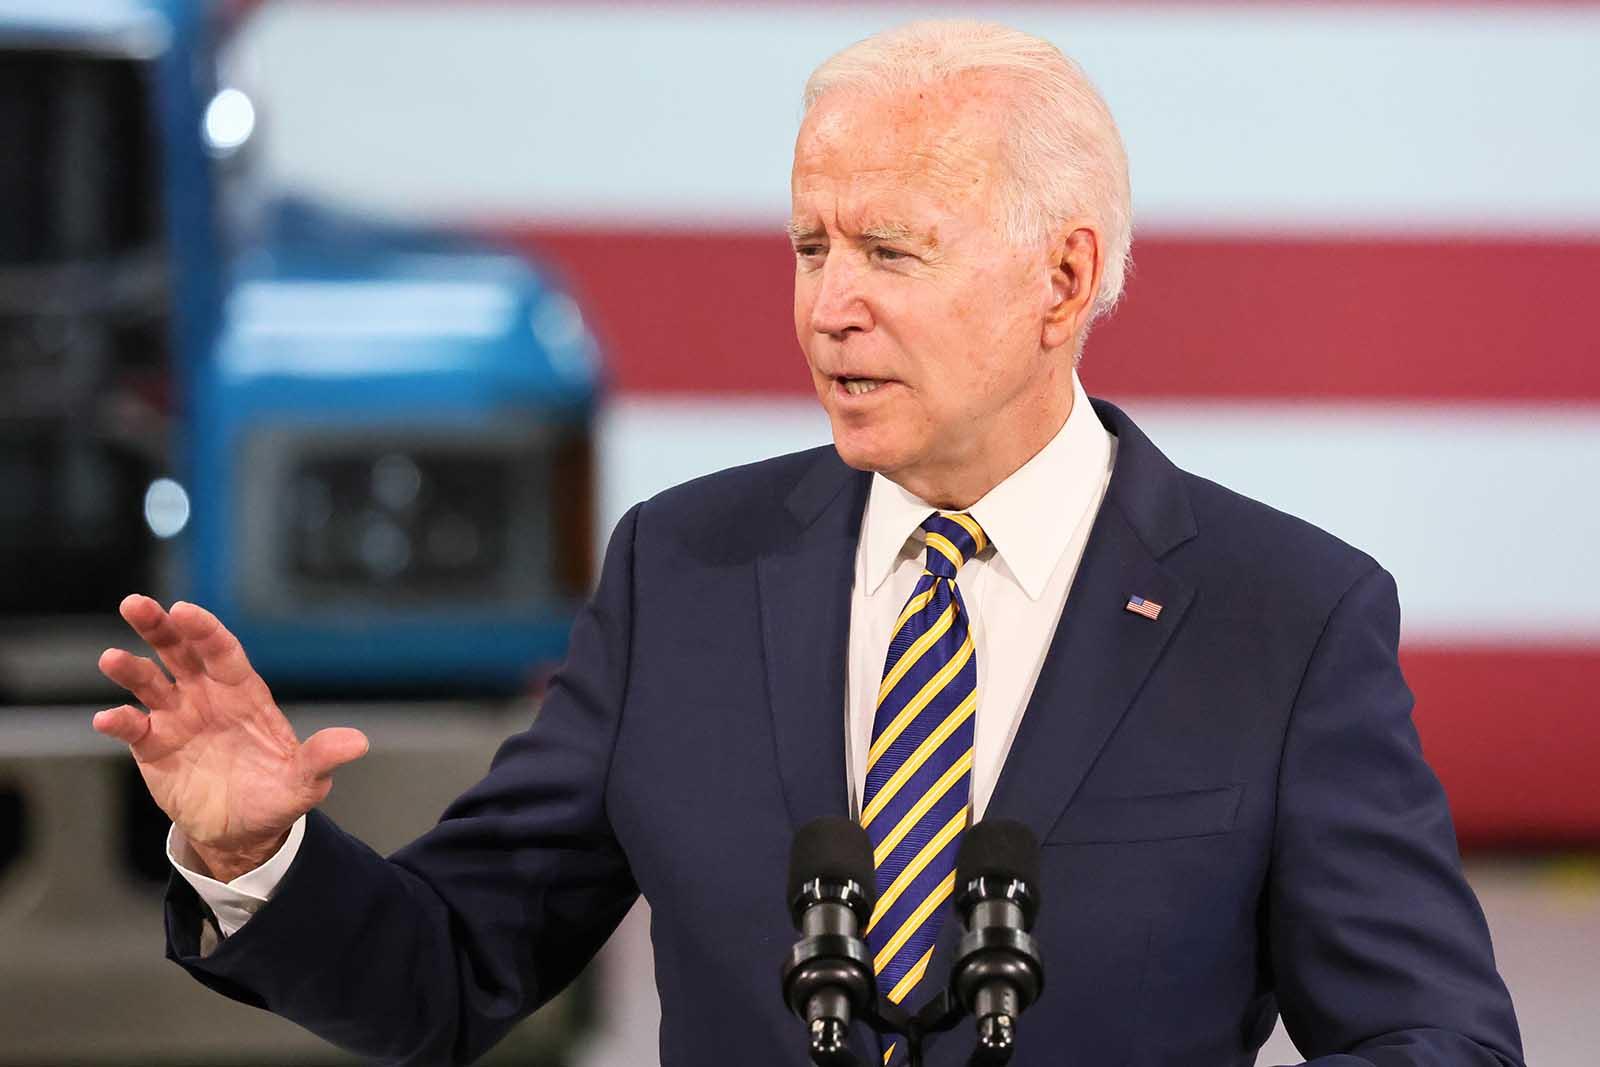 President Joe Biden speaks in Macungie, Pennsylvania, on July 28.